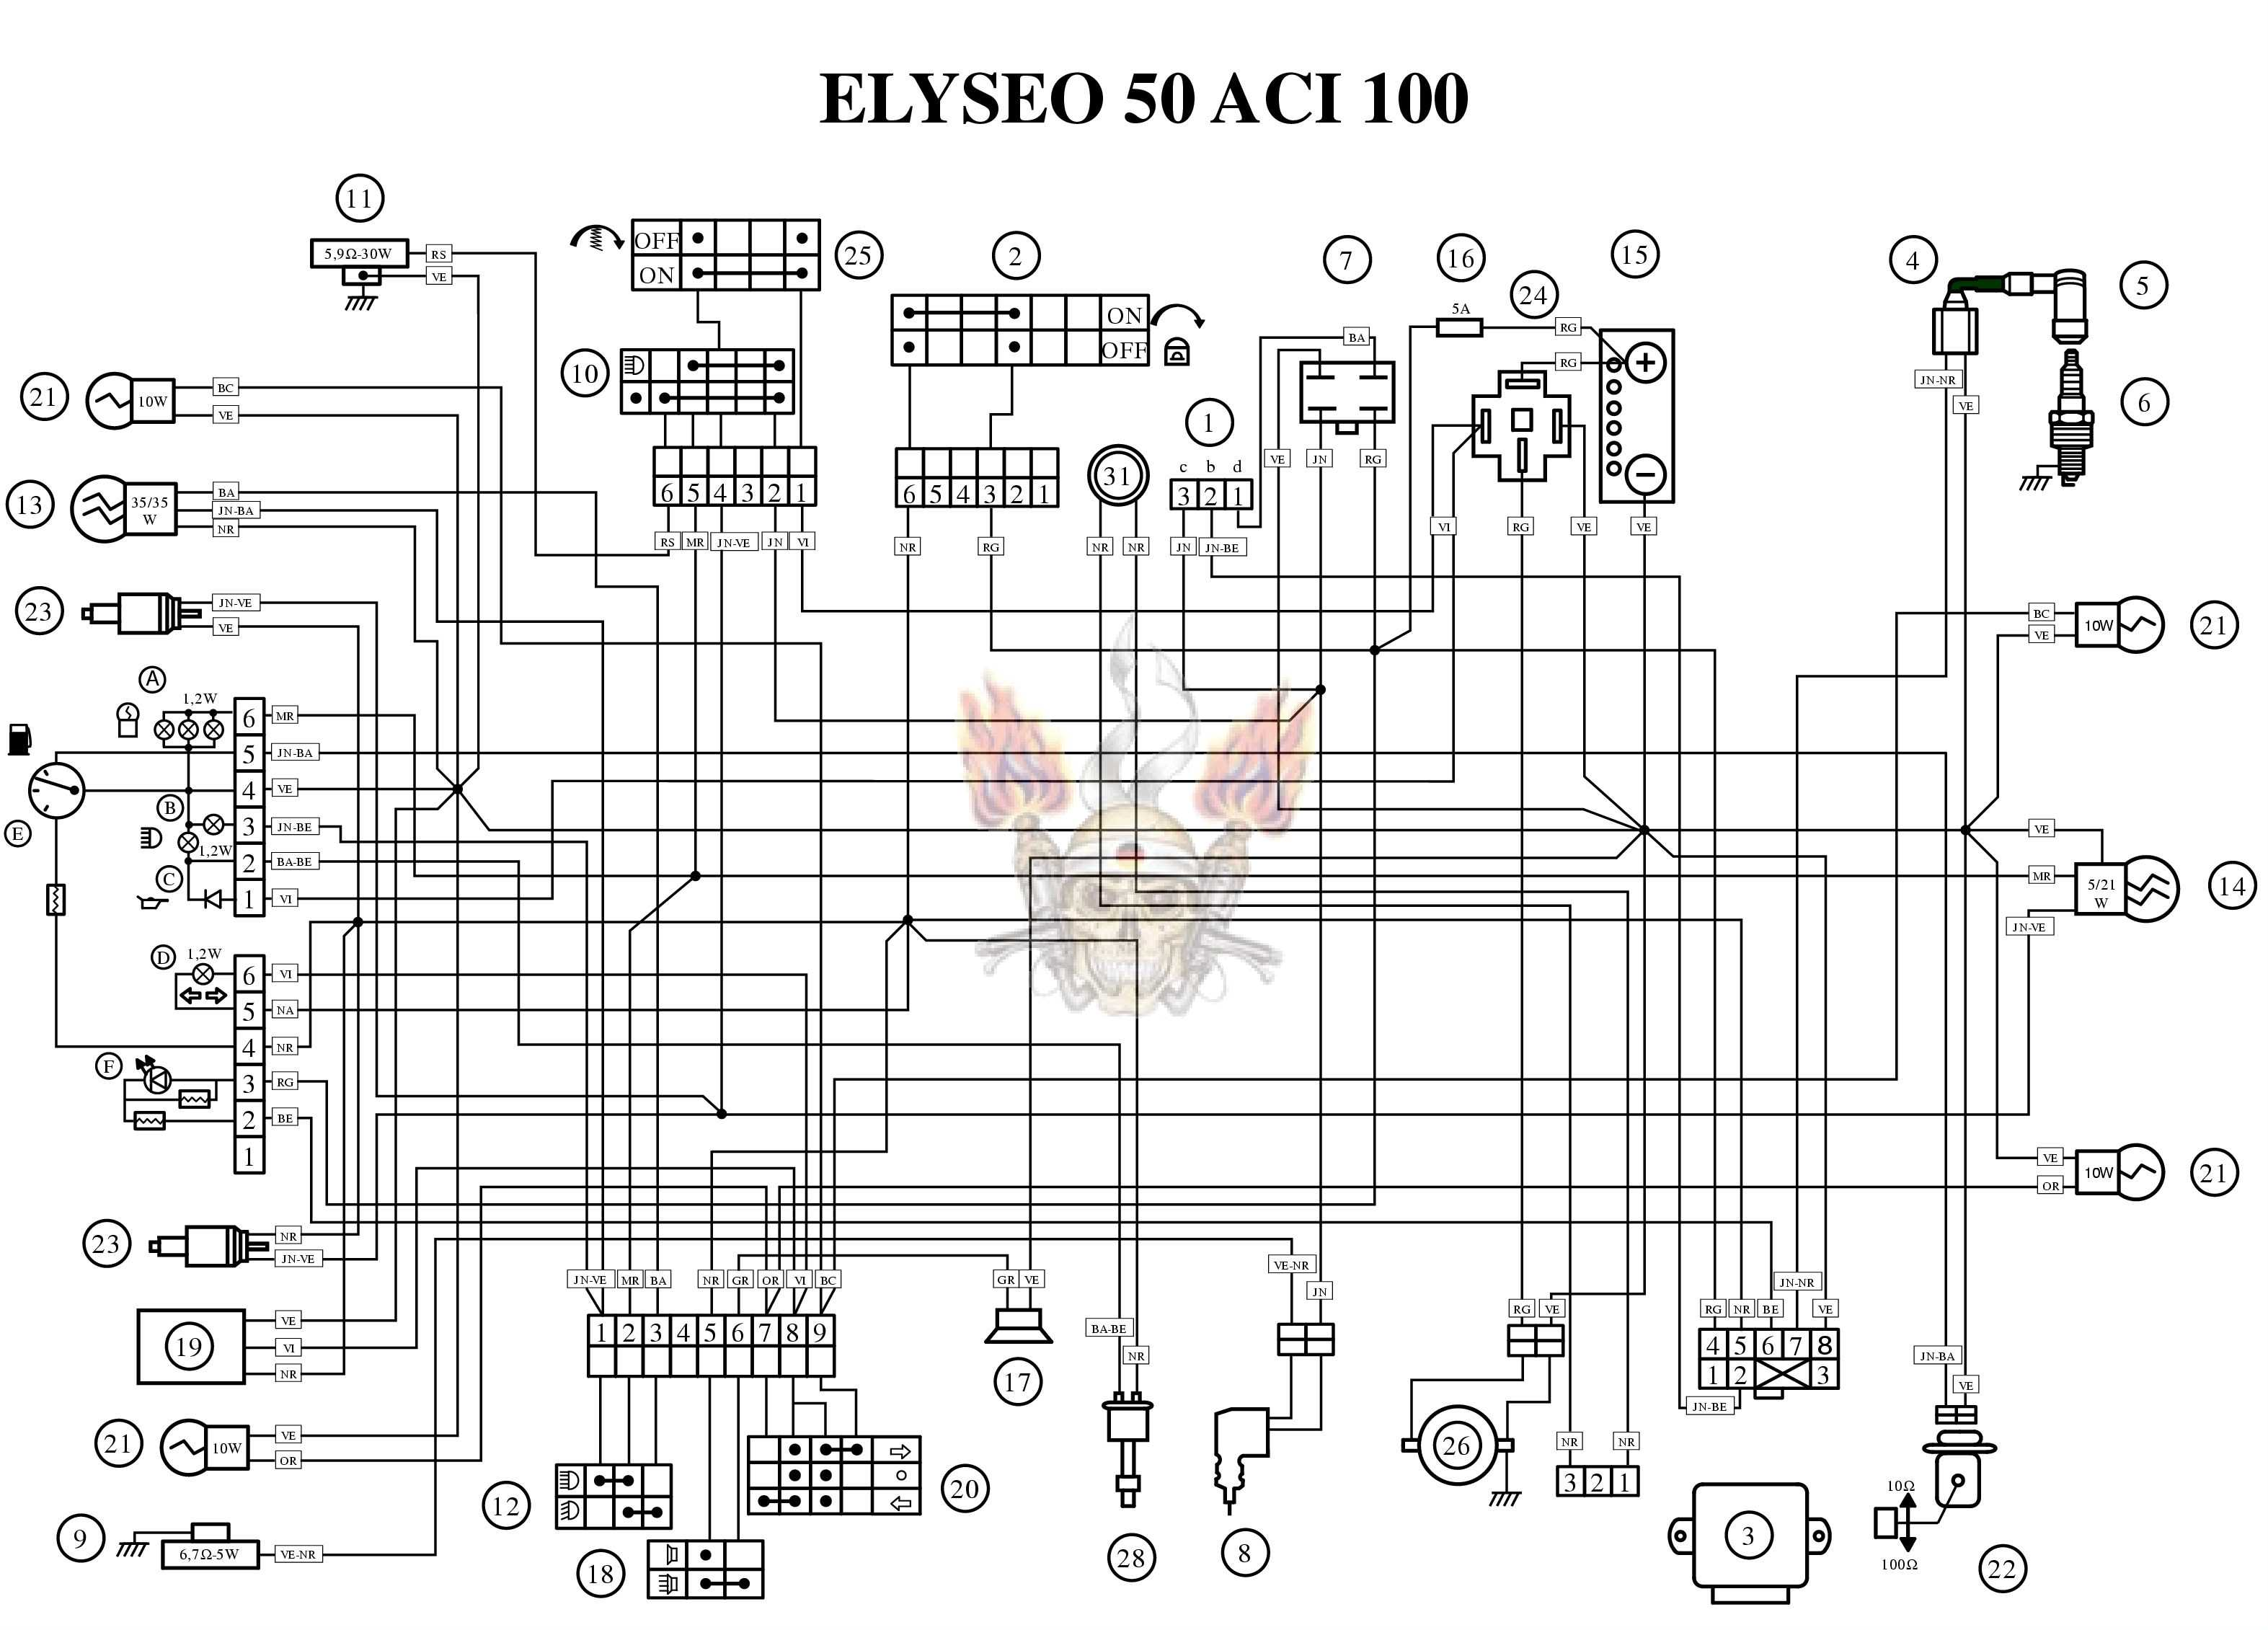 Breathtaking peugeot 7 cc wiring diagram gallery best image peugeot 206 indicator fuse location rolls ro engine diagram swarovskicordoba Image collections